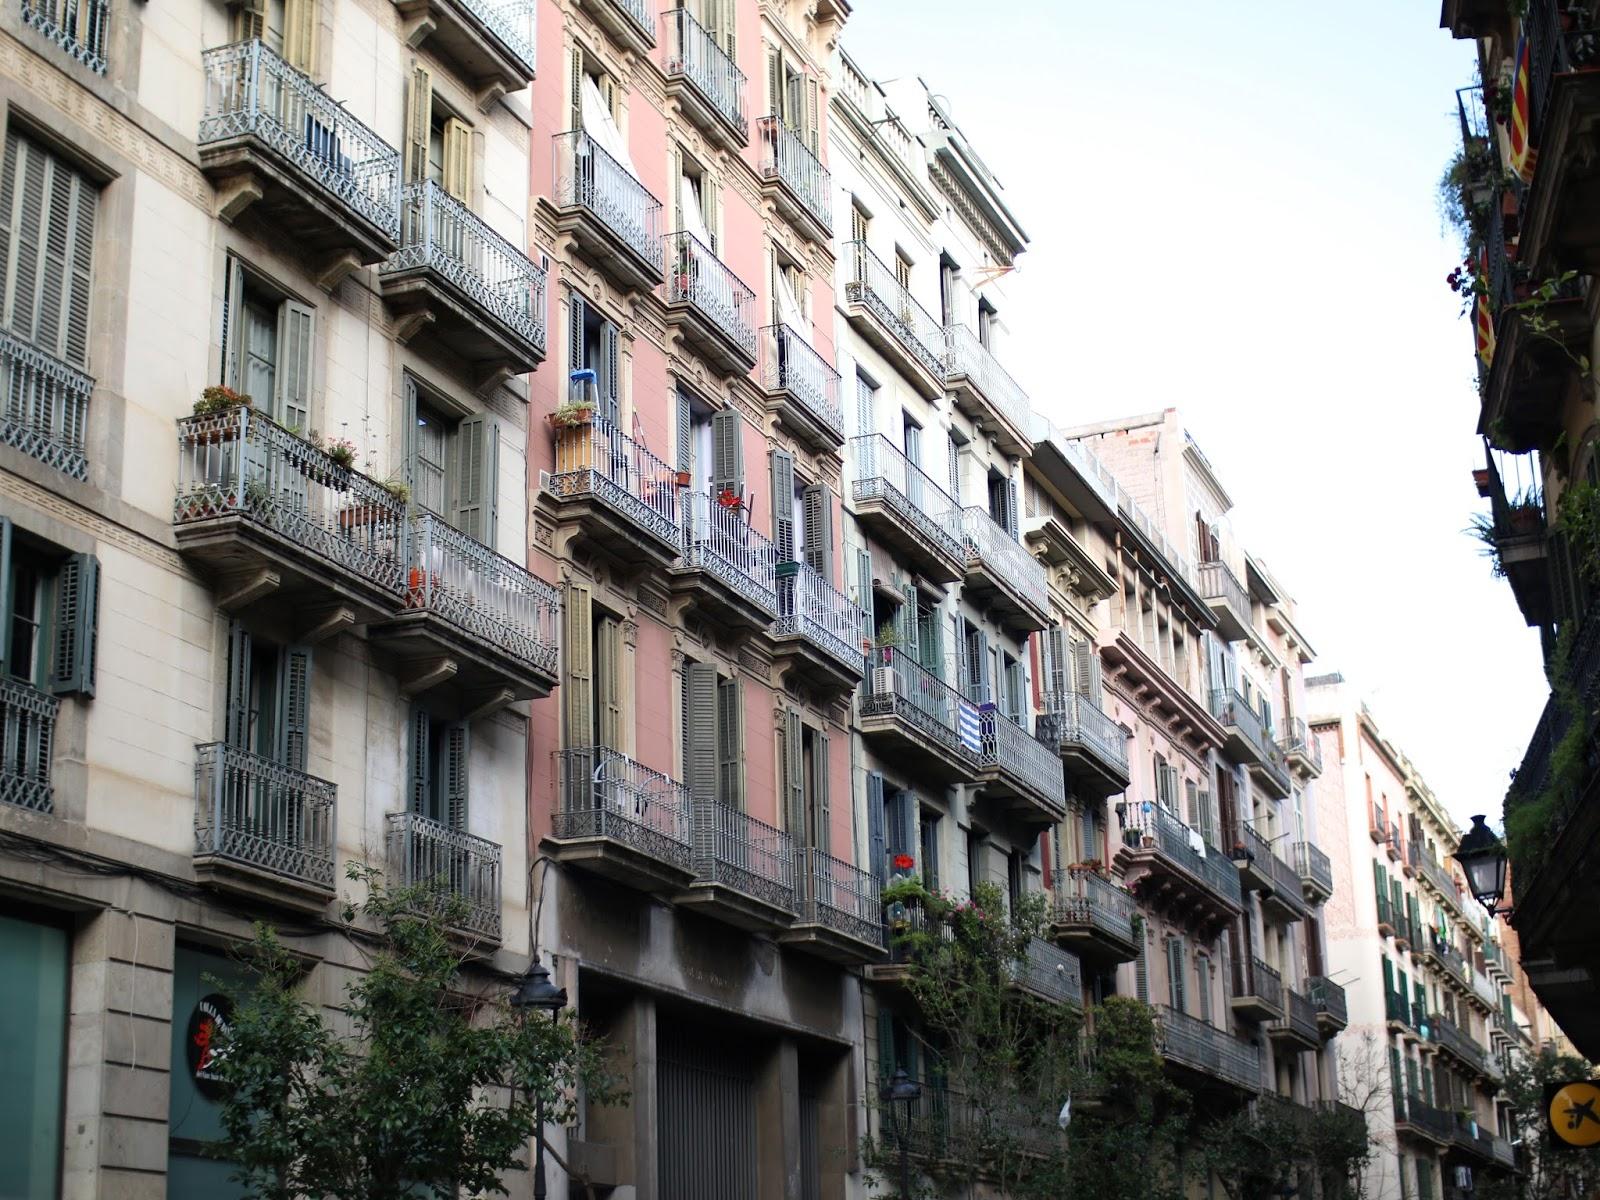 looking up at beautiful buildings in barcelona spain